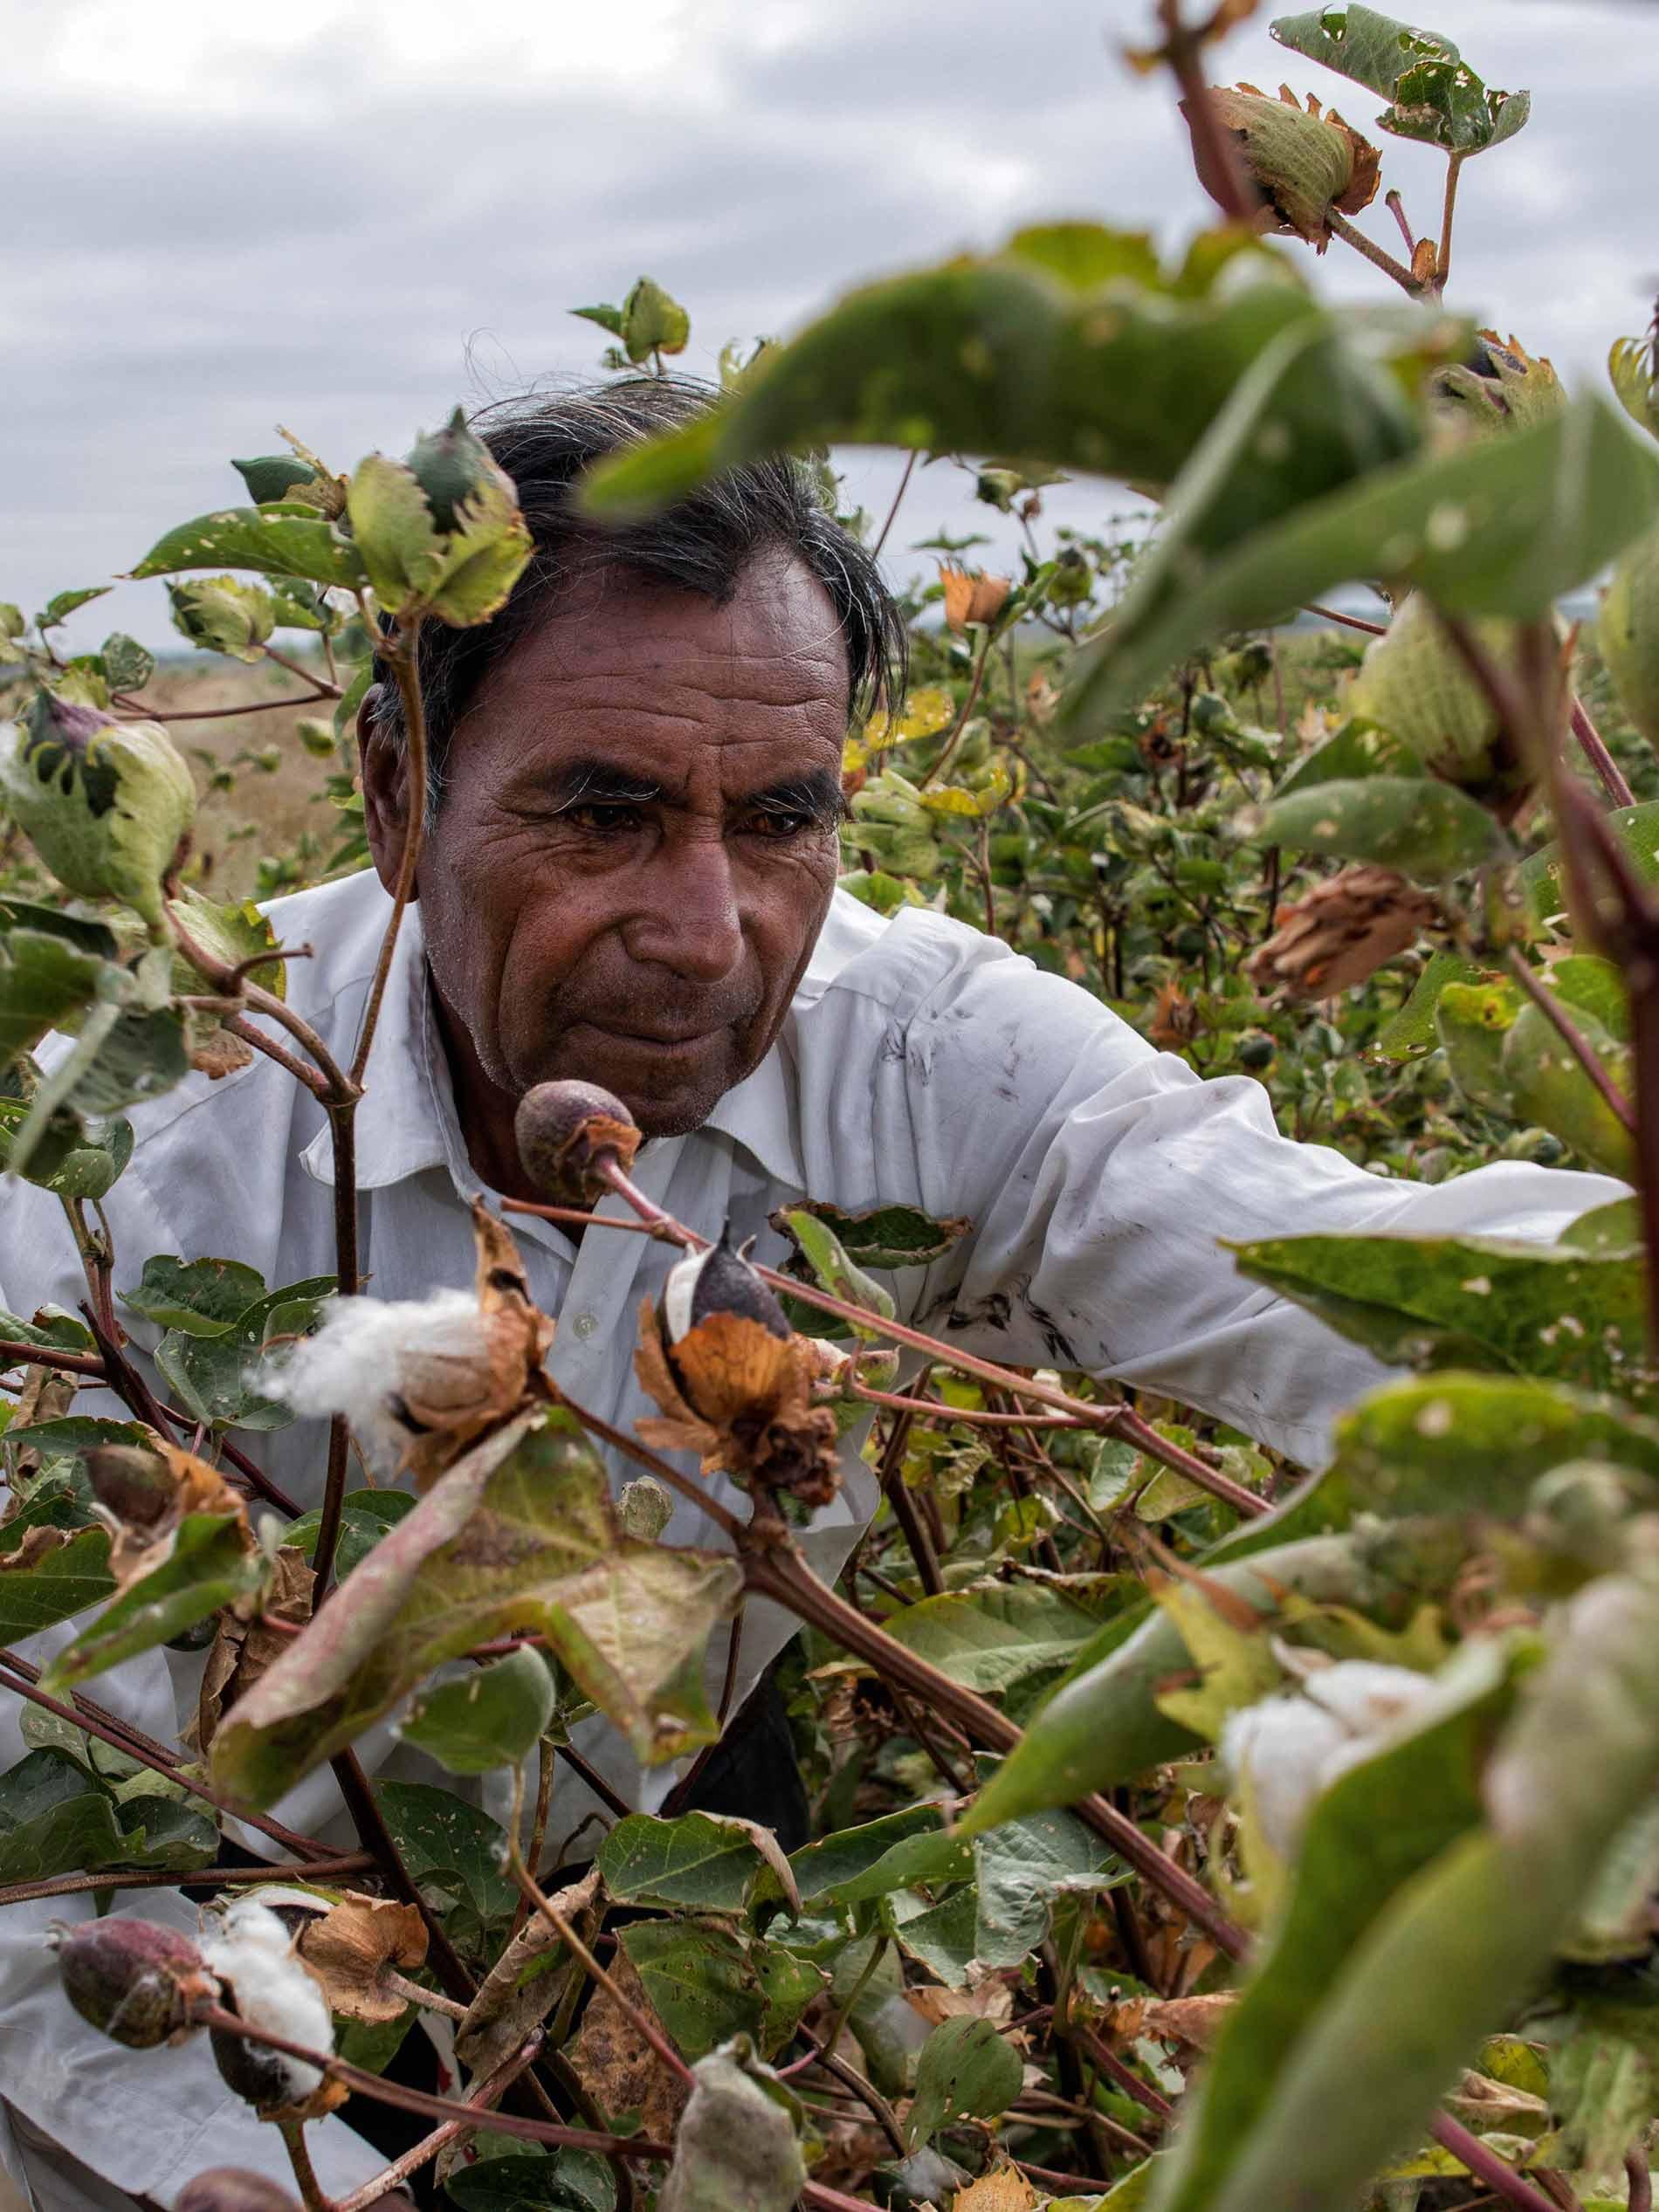 Cotton picker in Peru harvests the ripe cotton flowers   mey®